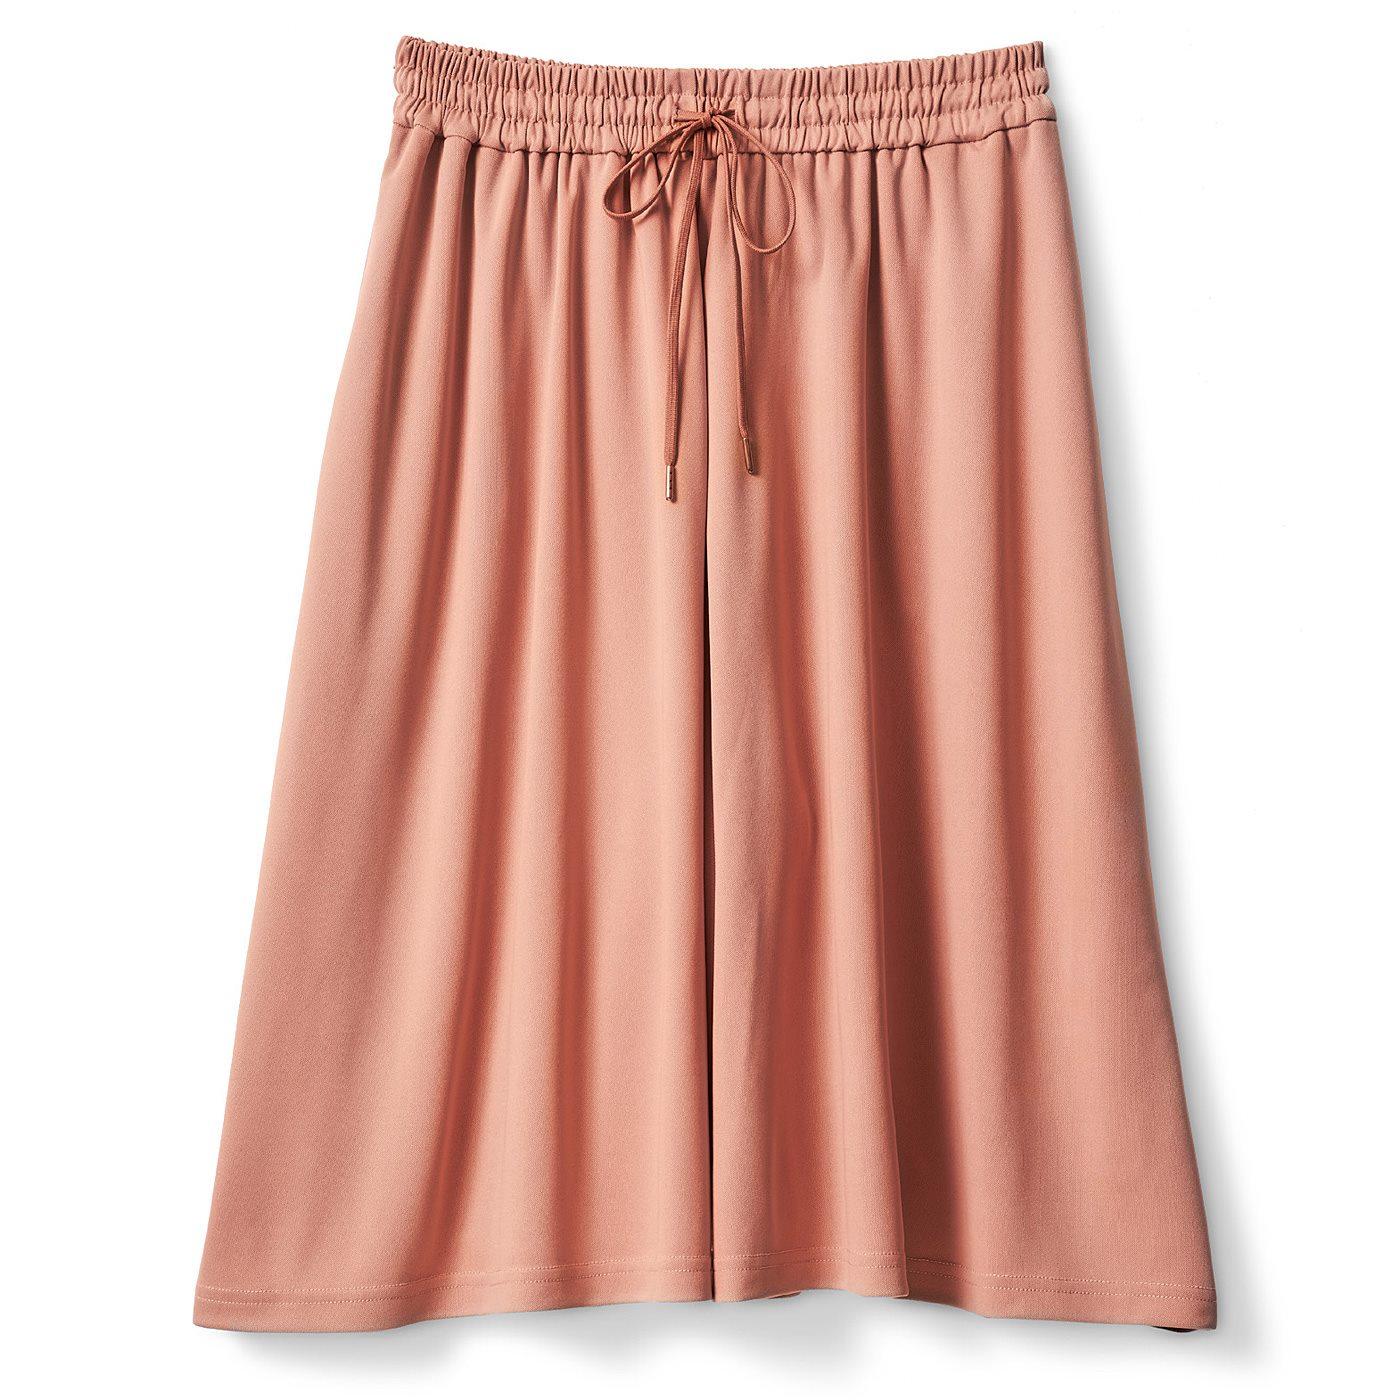 DRECO by IEDIT 仕事は部活だ!吸汗速乾でさらり快適な 本当にスカートに見えるスカーチョ<ダスティーピンク>